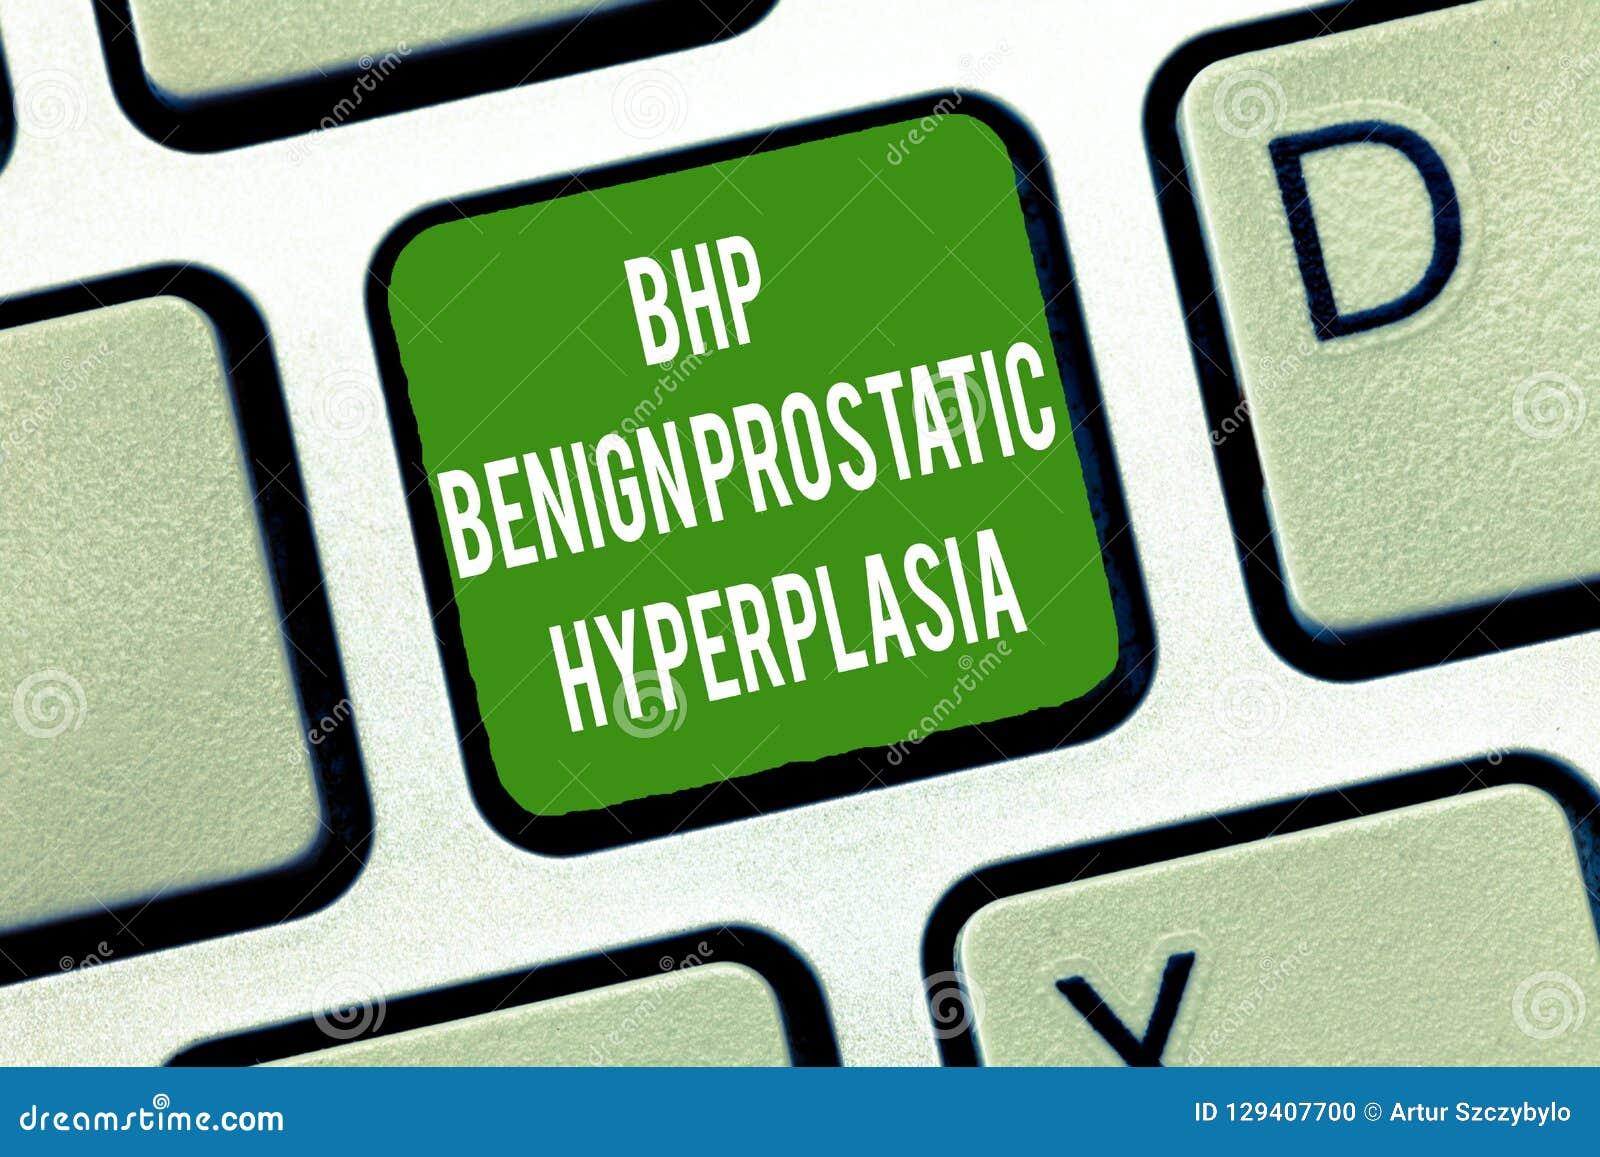 Text sign showing Bhp Benign Prostatic Hyperplasia. Conceptual photo Noncancerous prostate gland enlargement